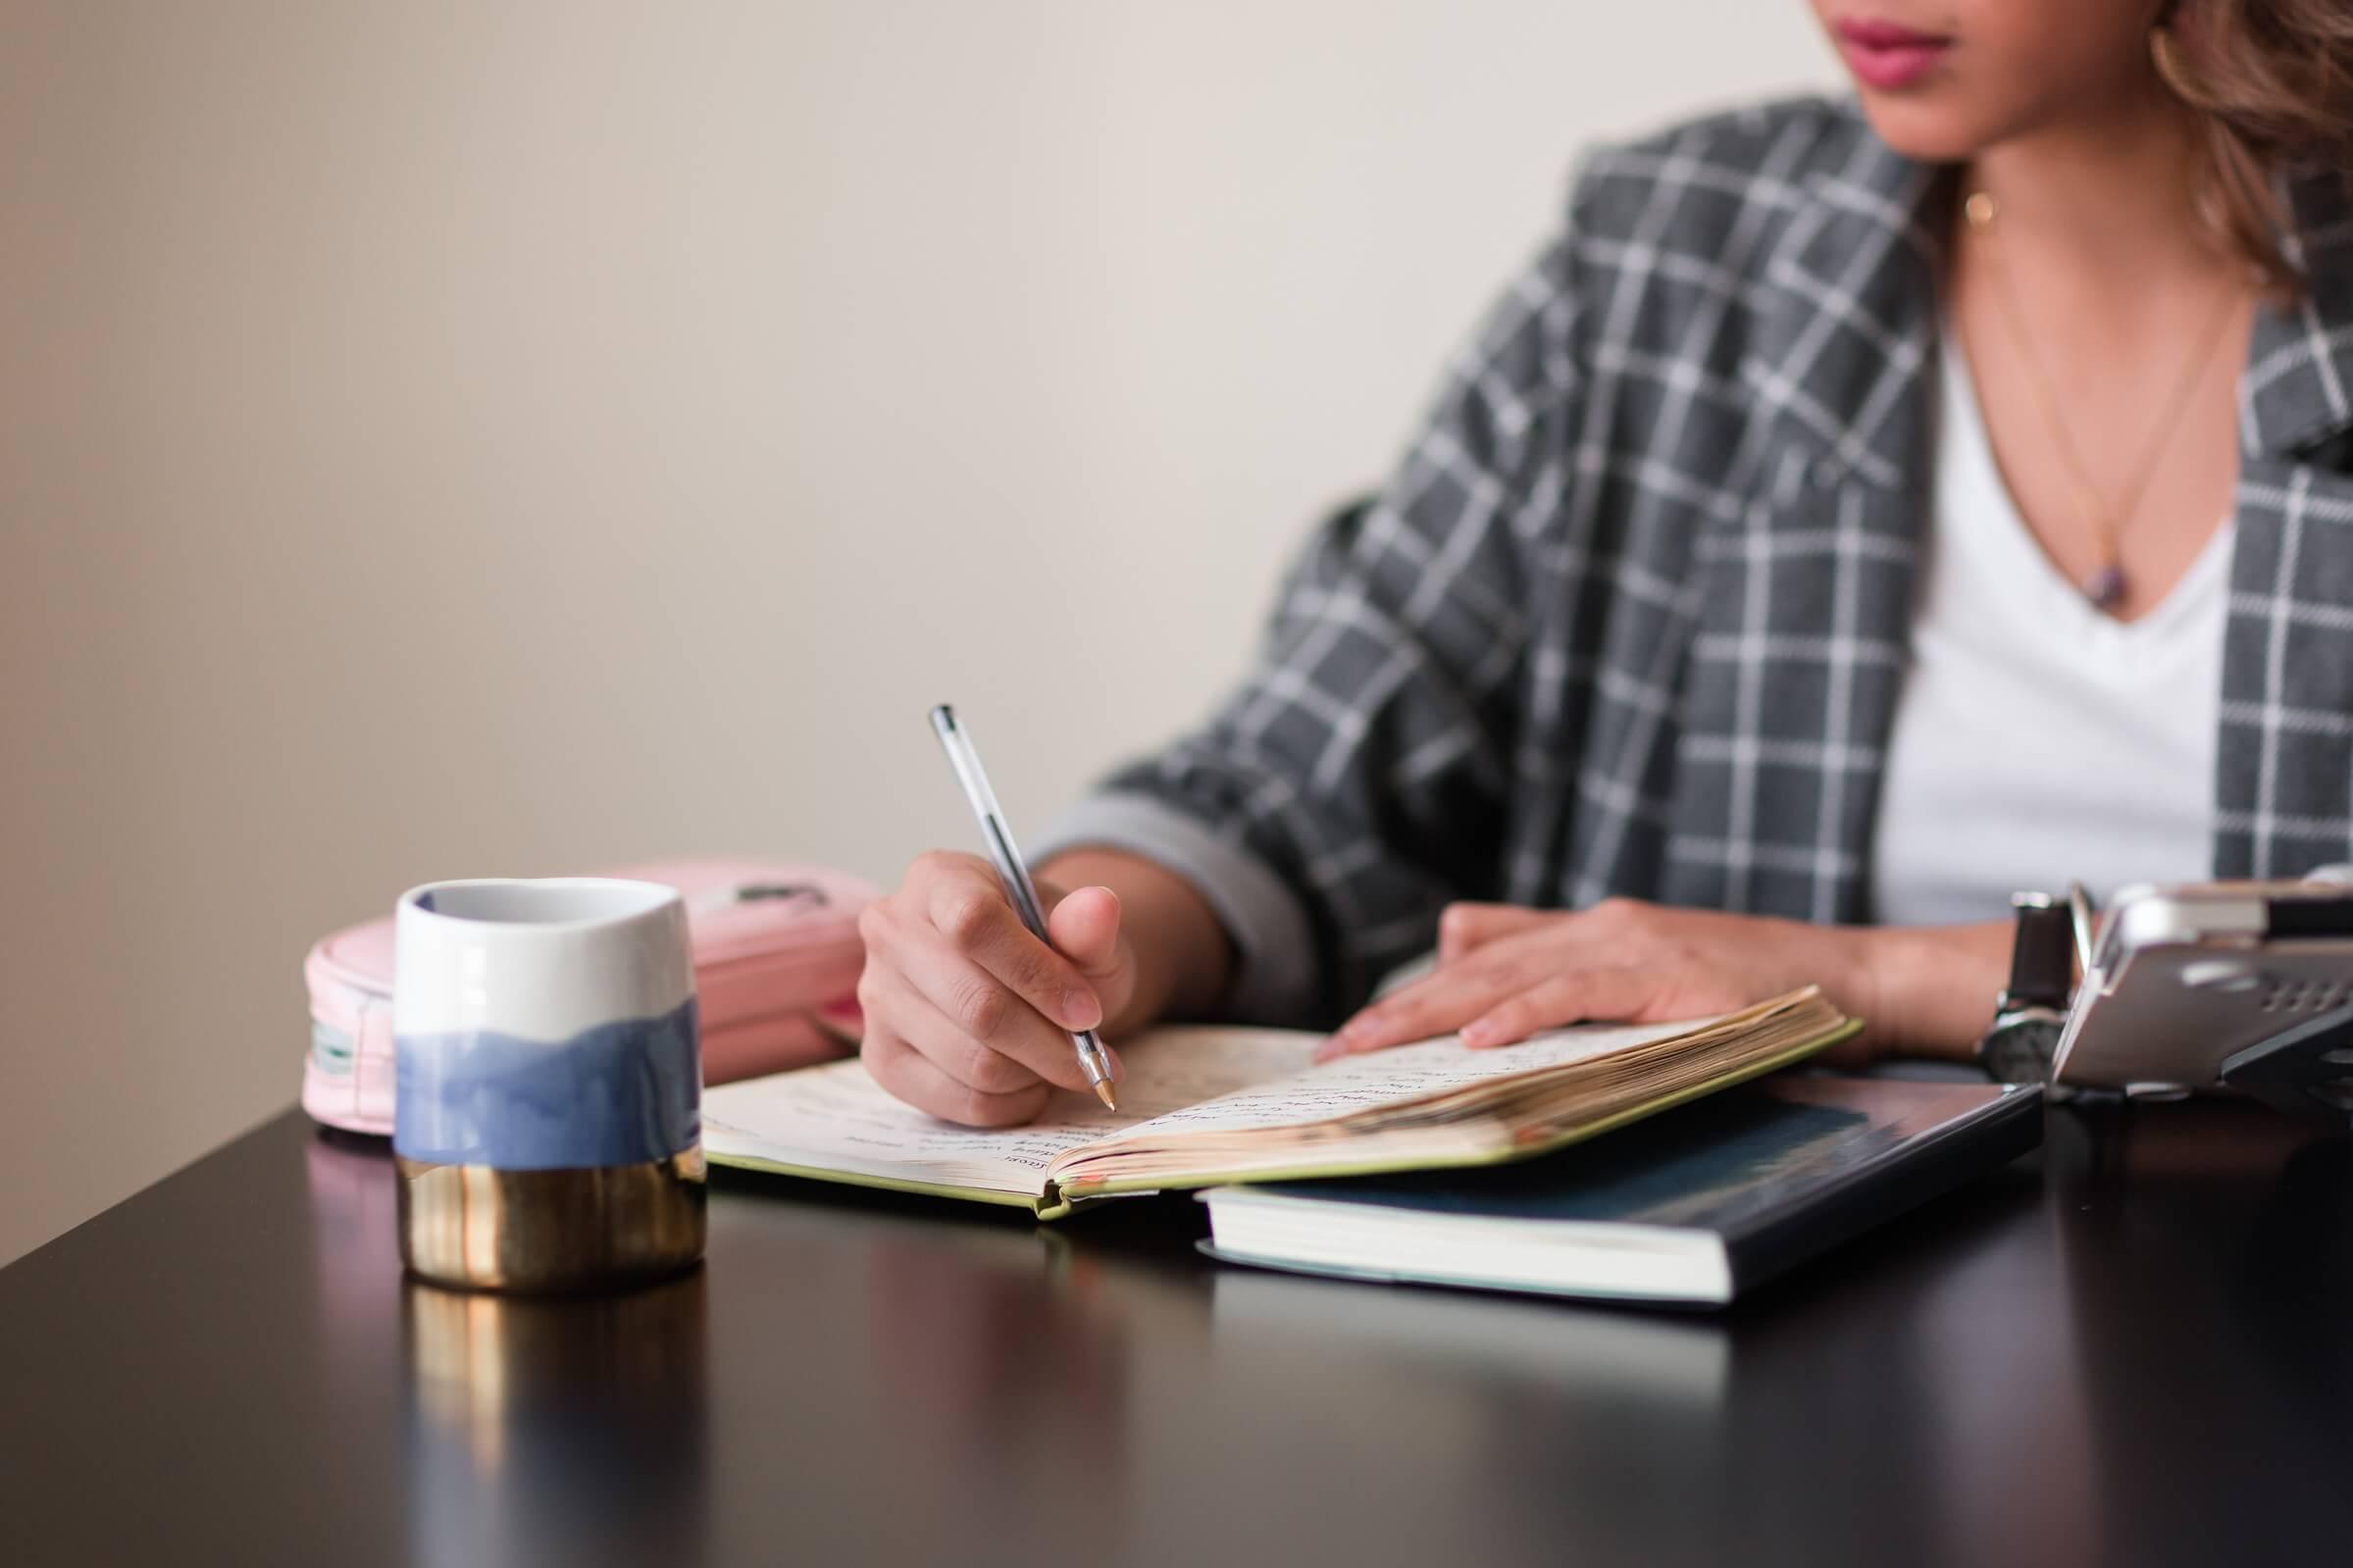 copywriter taking notes in their journal